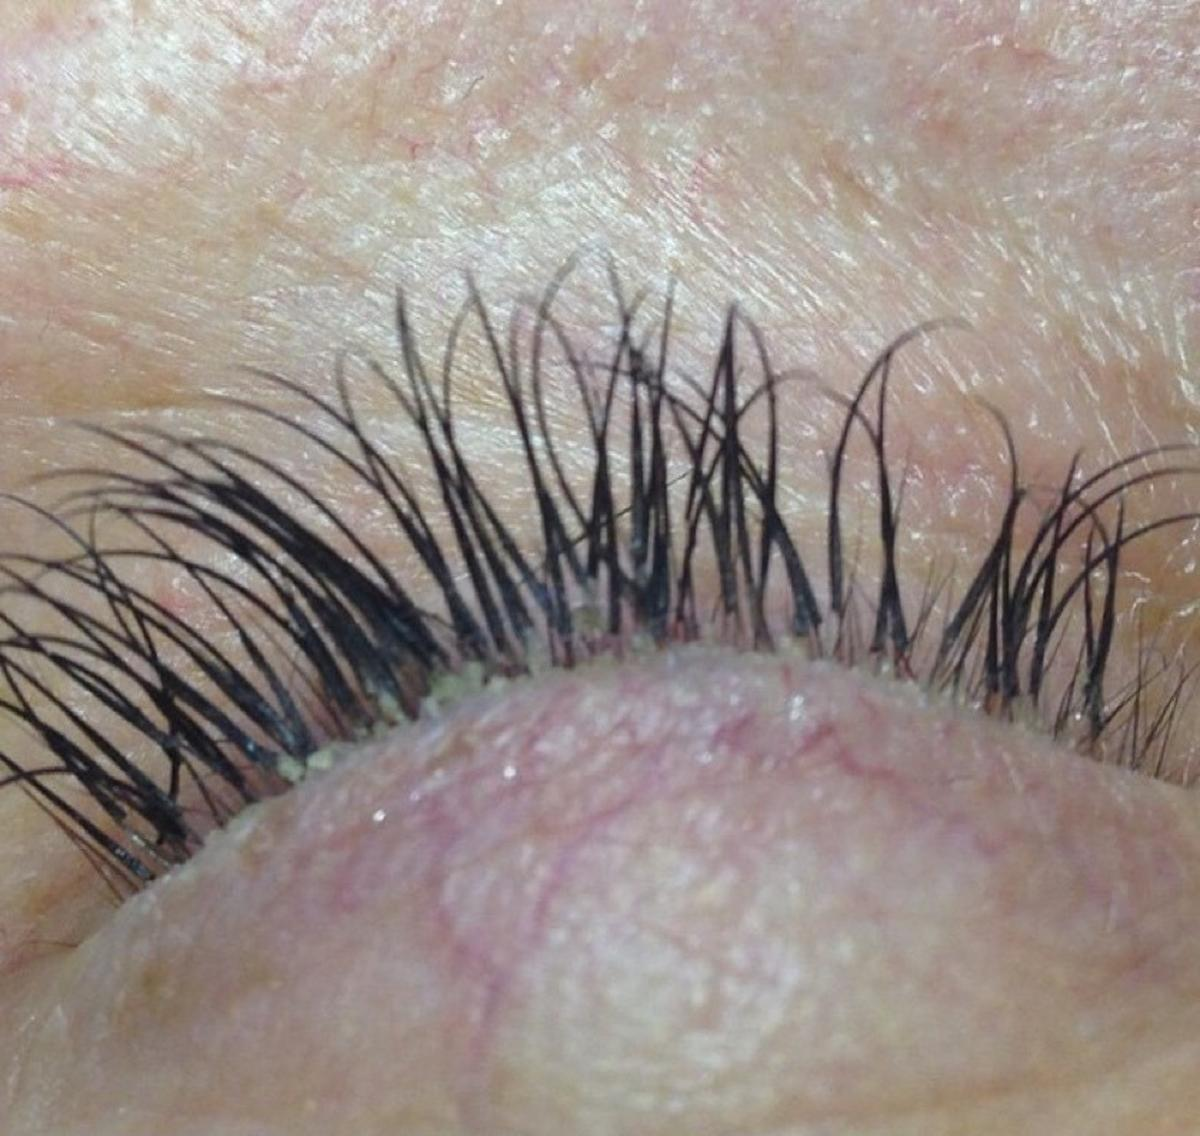 State cites 67 unlicensed eyelash aestheticians - Deseret News